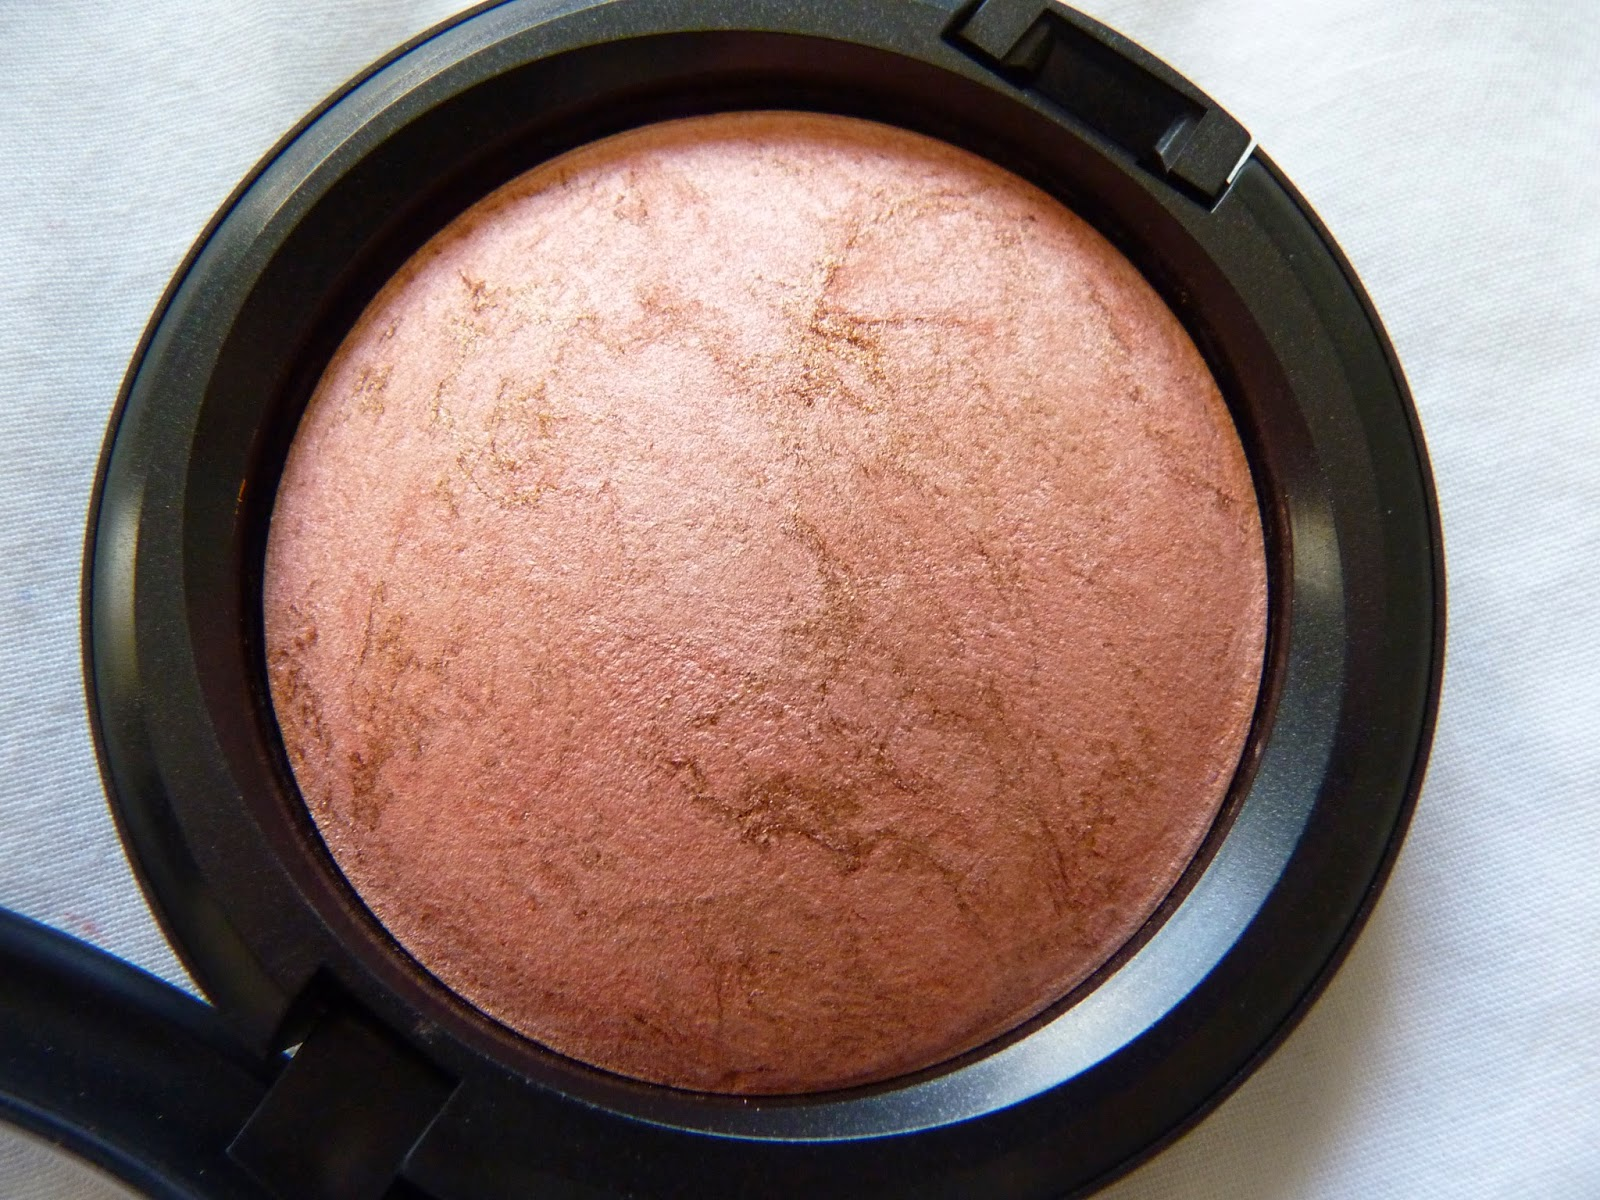 MAC Mineralize Skin Finish MSF Stereo Rose Blush Highlight